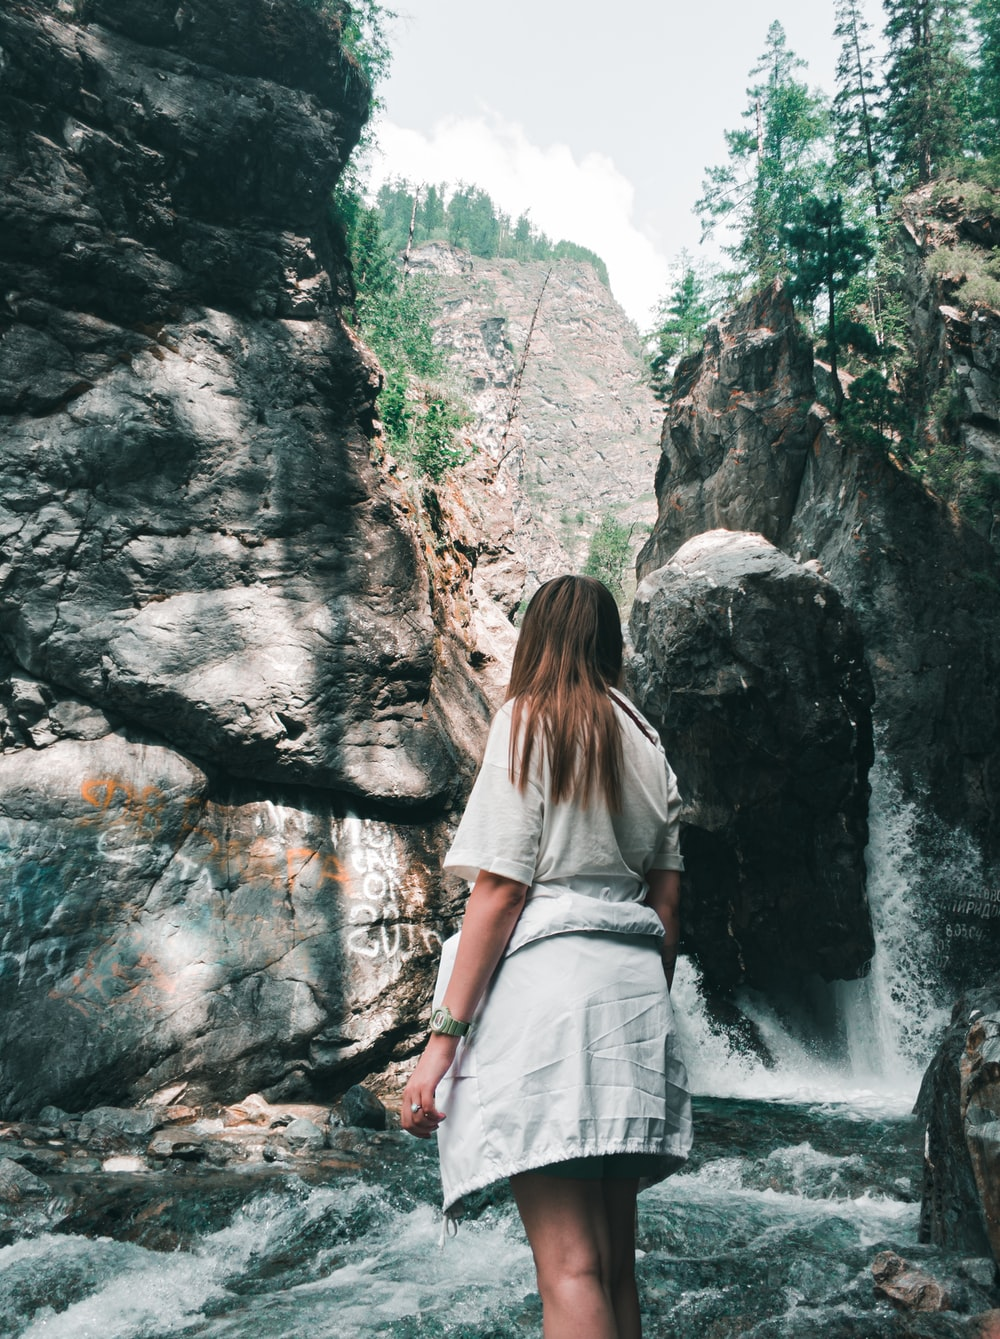 woman in white shirt and white skirt standing near waterfalls during daytime